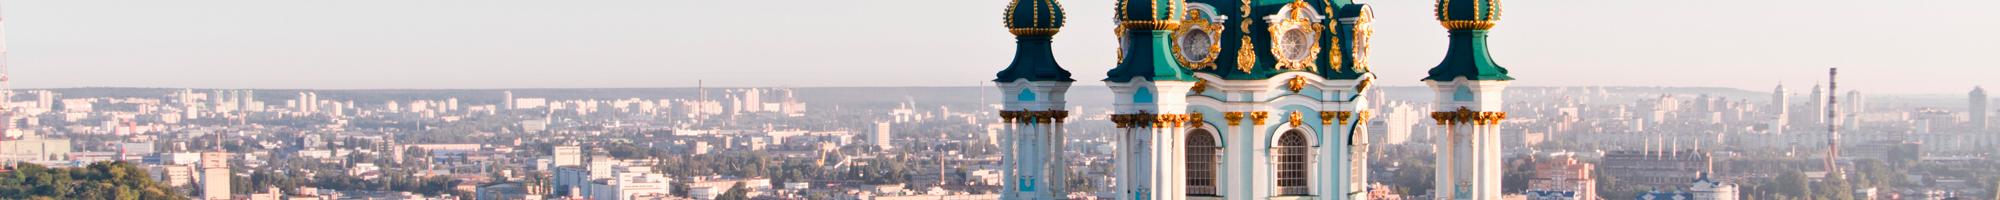 Hoteles 2 estrellas en Donetsk